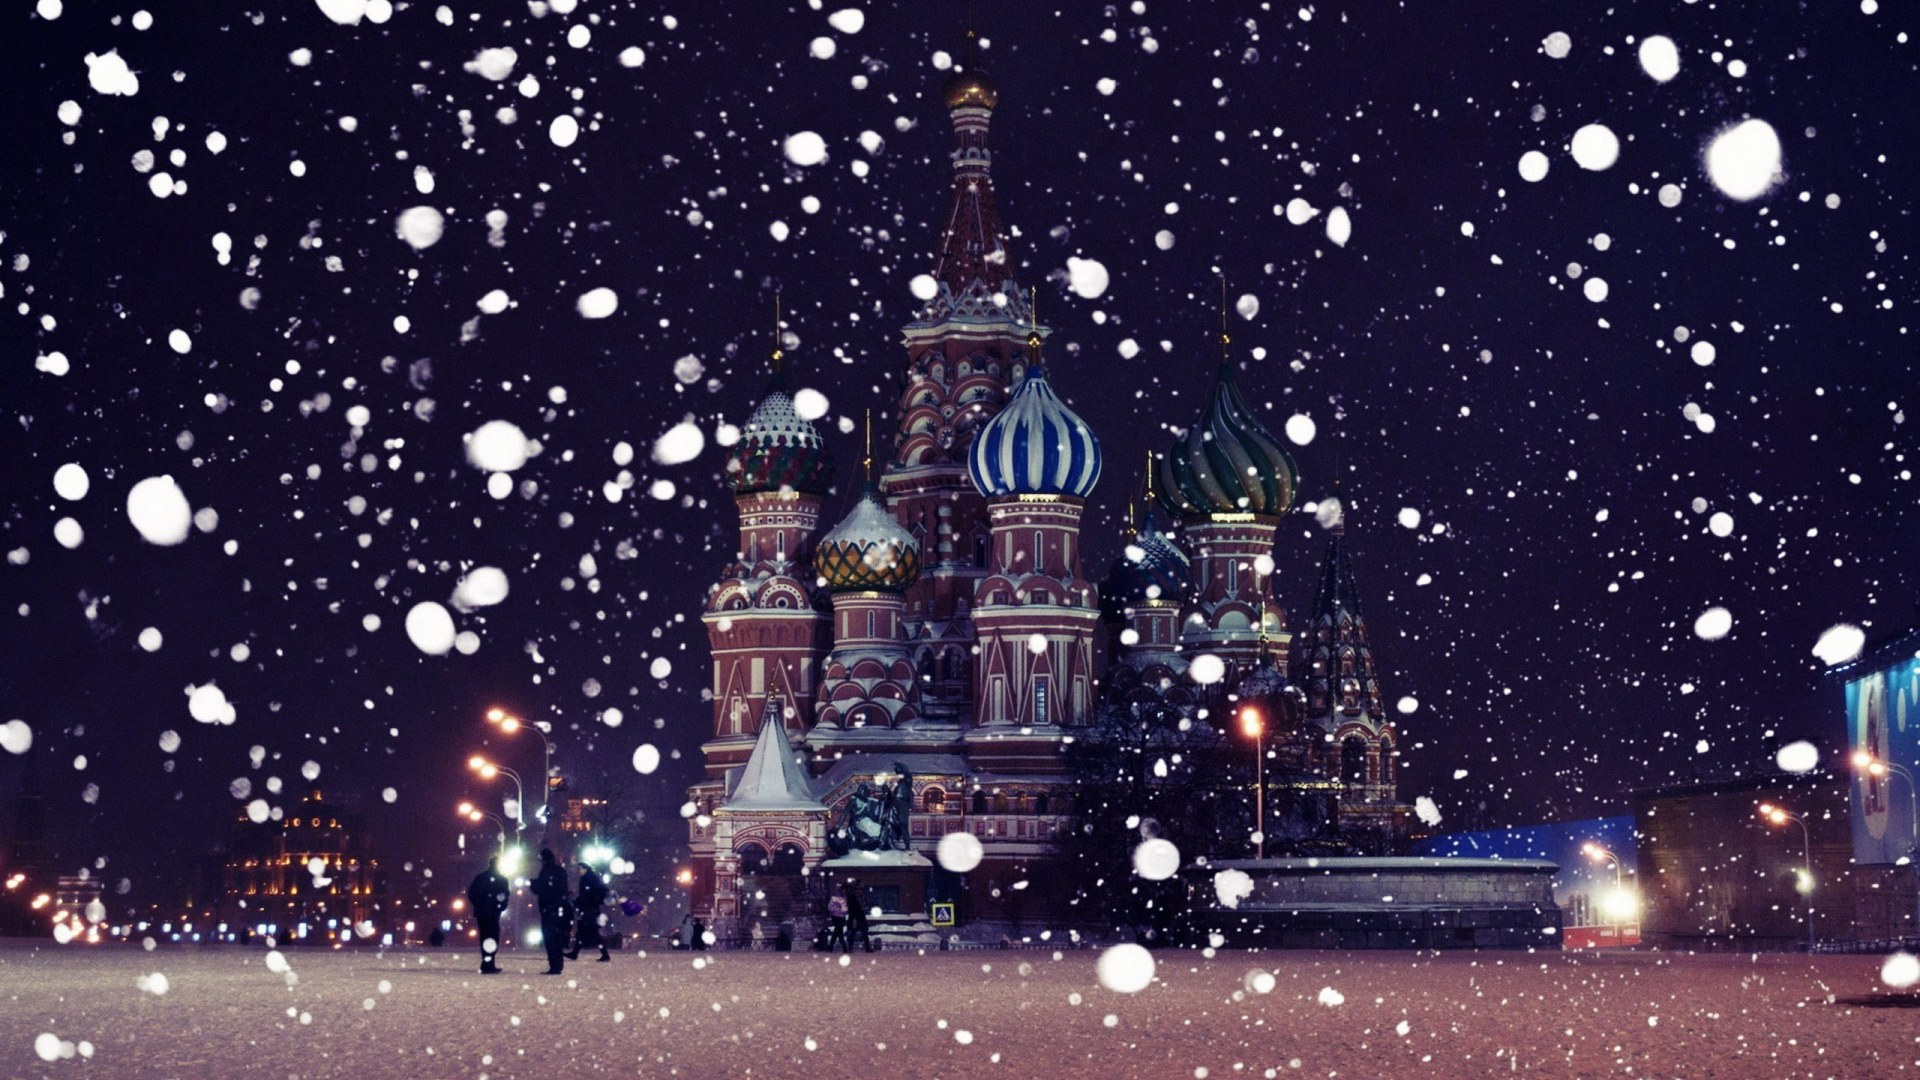 Wa11papers ru cities winter 15 12 2013 1920x1080 026